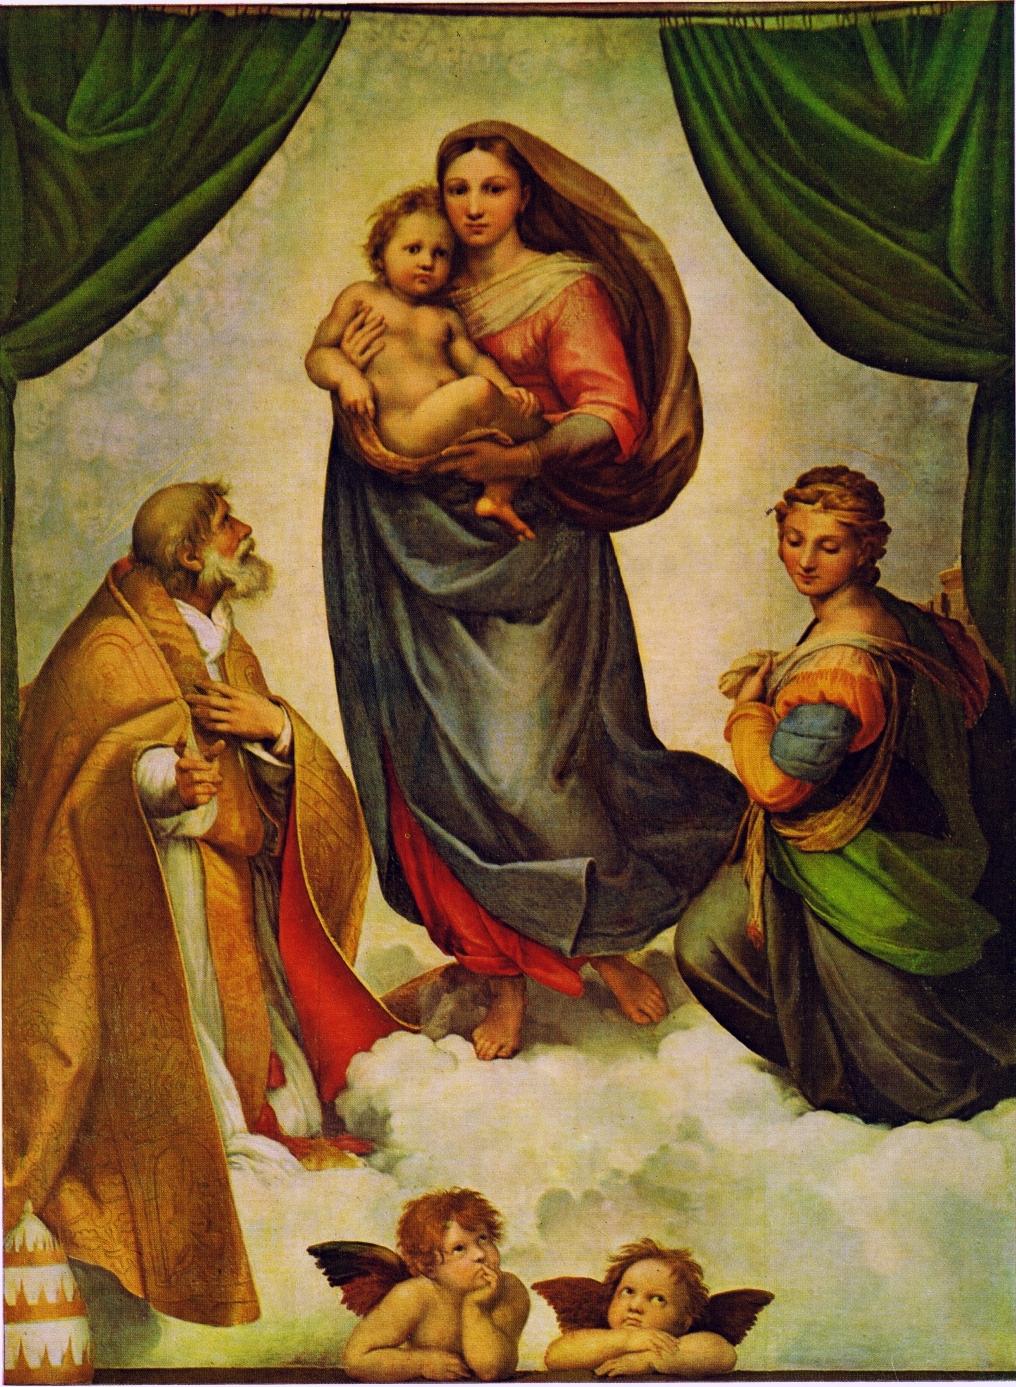 http://upload.wikimedia.org/wikipedia/commons/d/dc/Raffaello_Sanzio_-_Madonna_Sistina.jpg